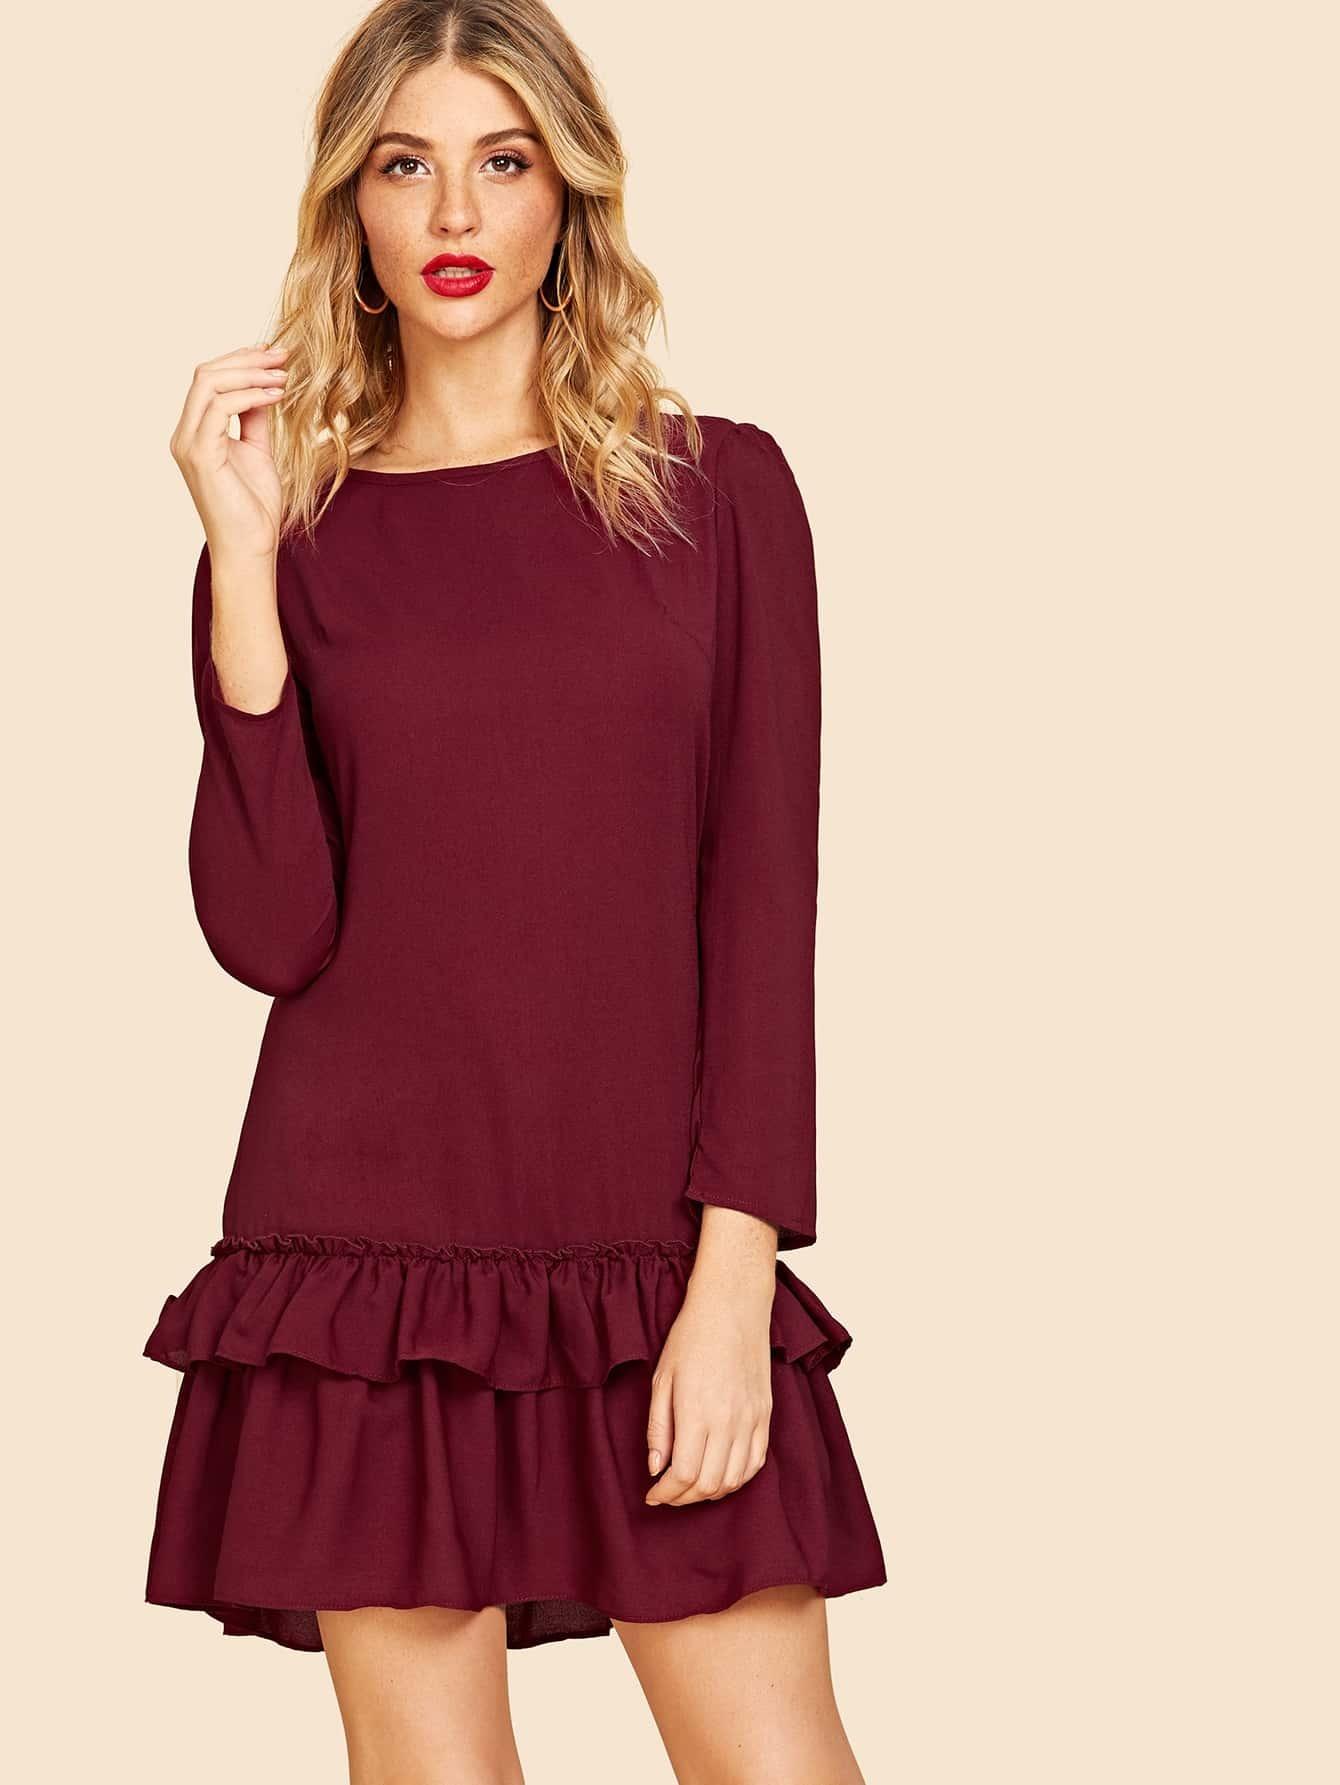 Купить Туника платье с оборками, Nathane, SheIn